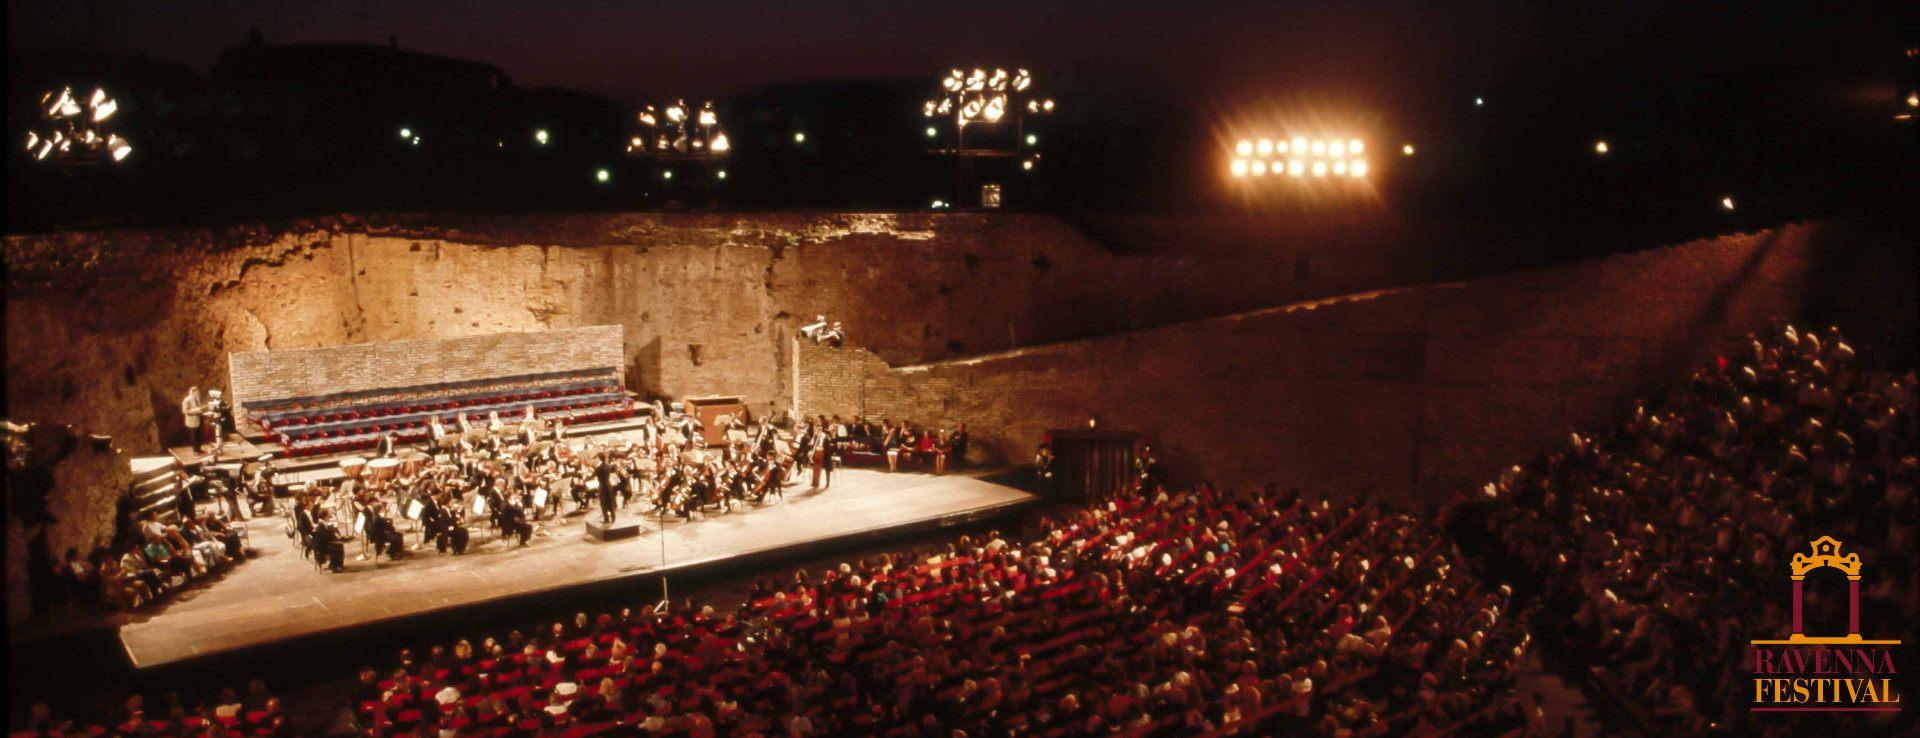 Ravenna-Festival 2020